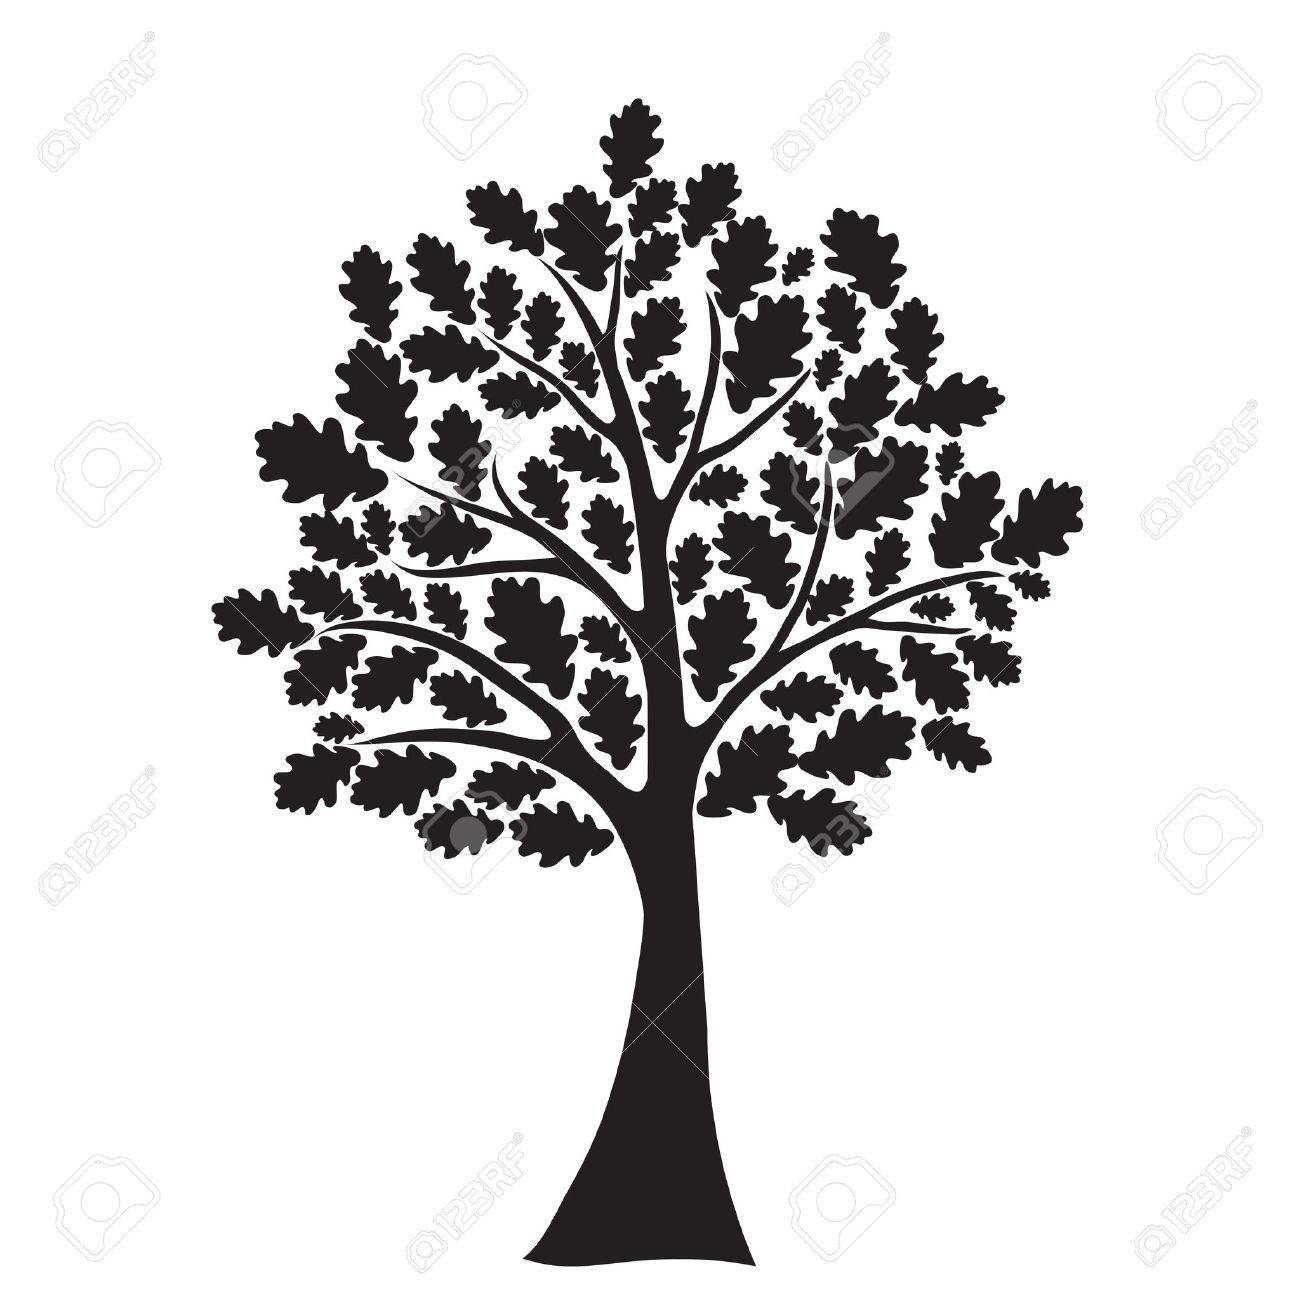 black oak tree royalty free cliparts vectors and stock rh 123rf com oak tree victorian boots oak tree vector image